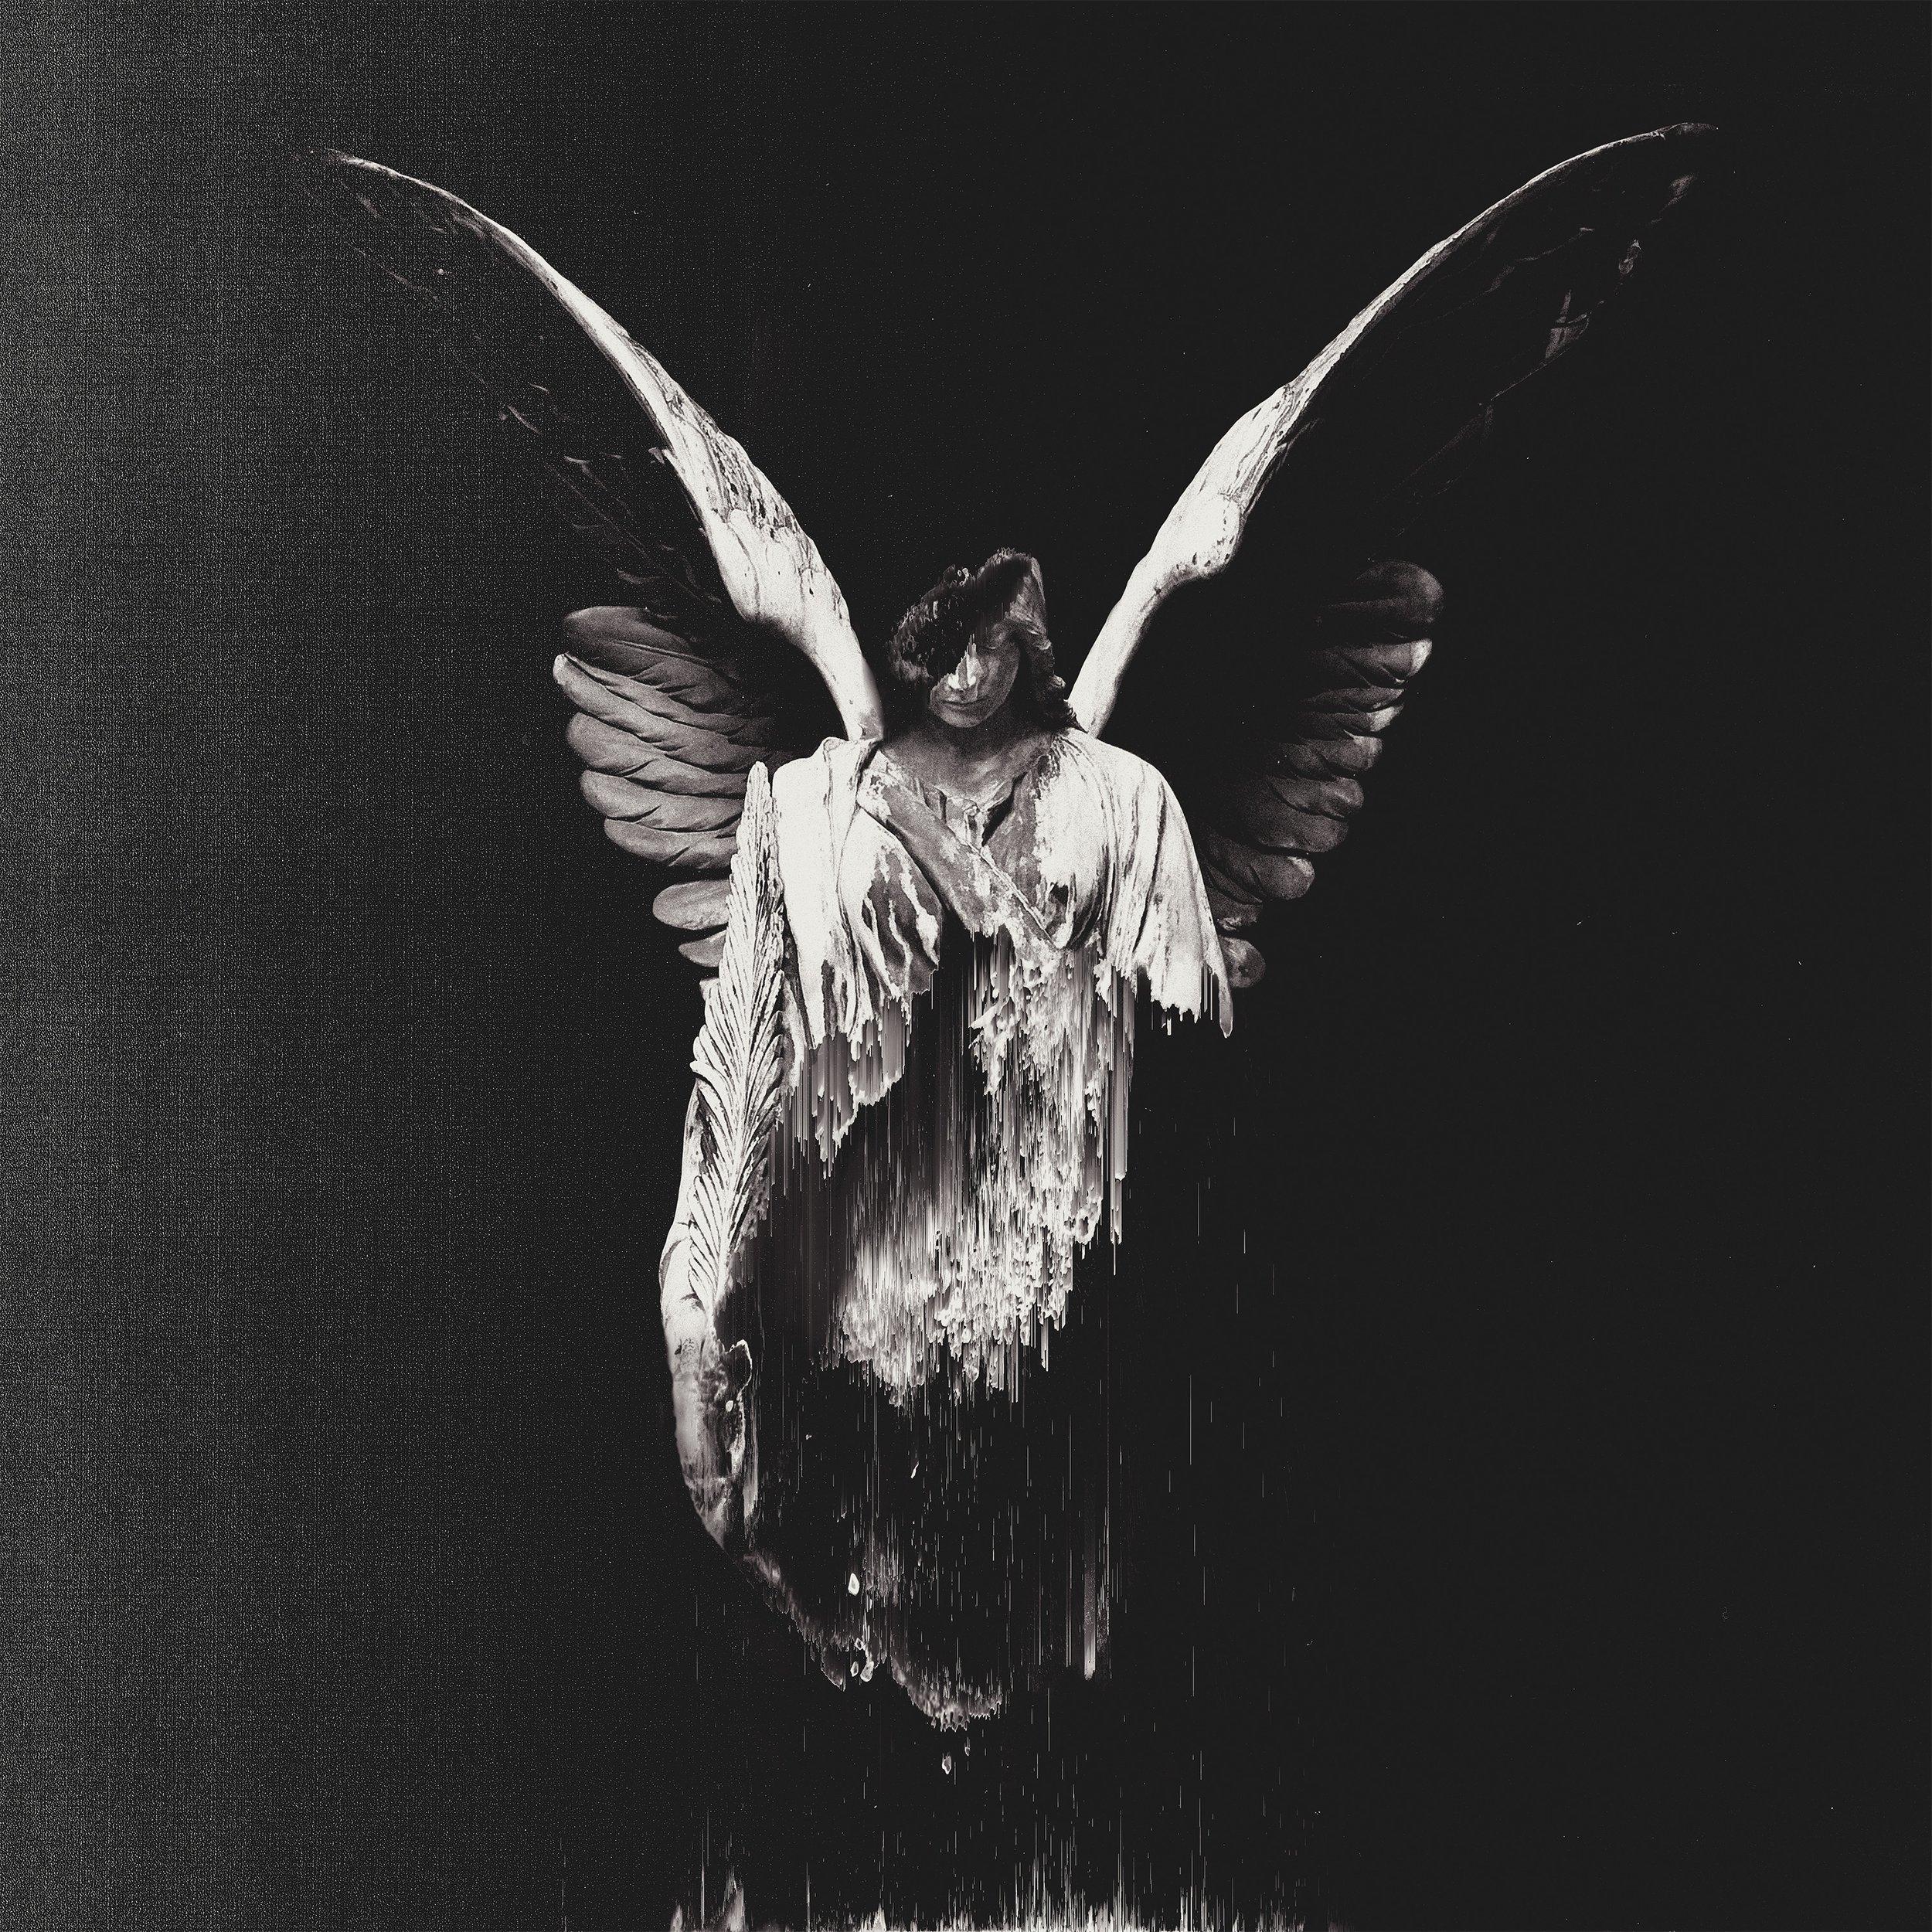 UNDEROATH - ERASE ME ALBUM REVIEW